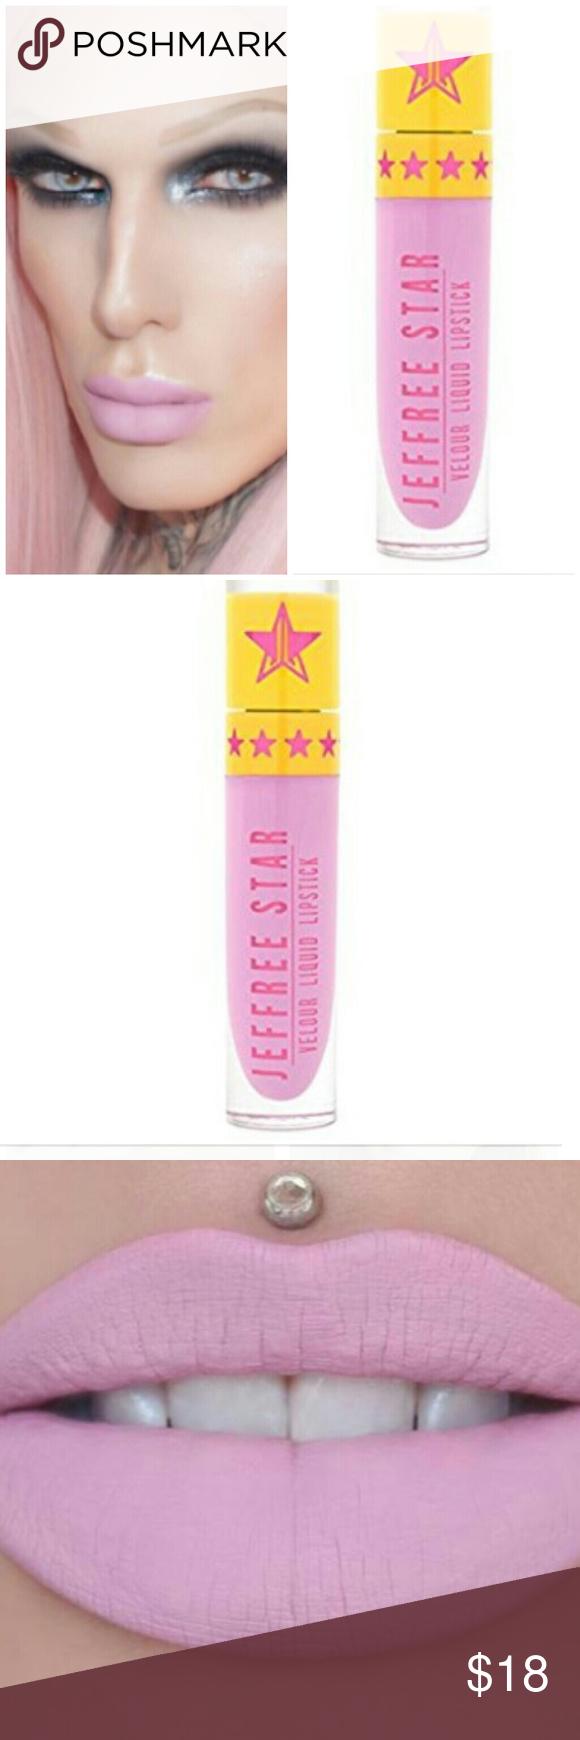 Jeffree Star velour liquid lipstick Jeffree Star velour